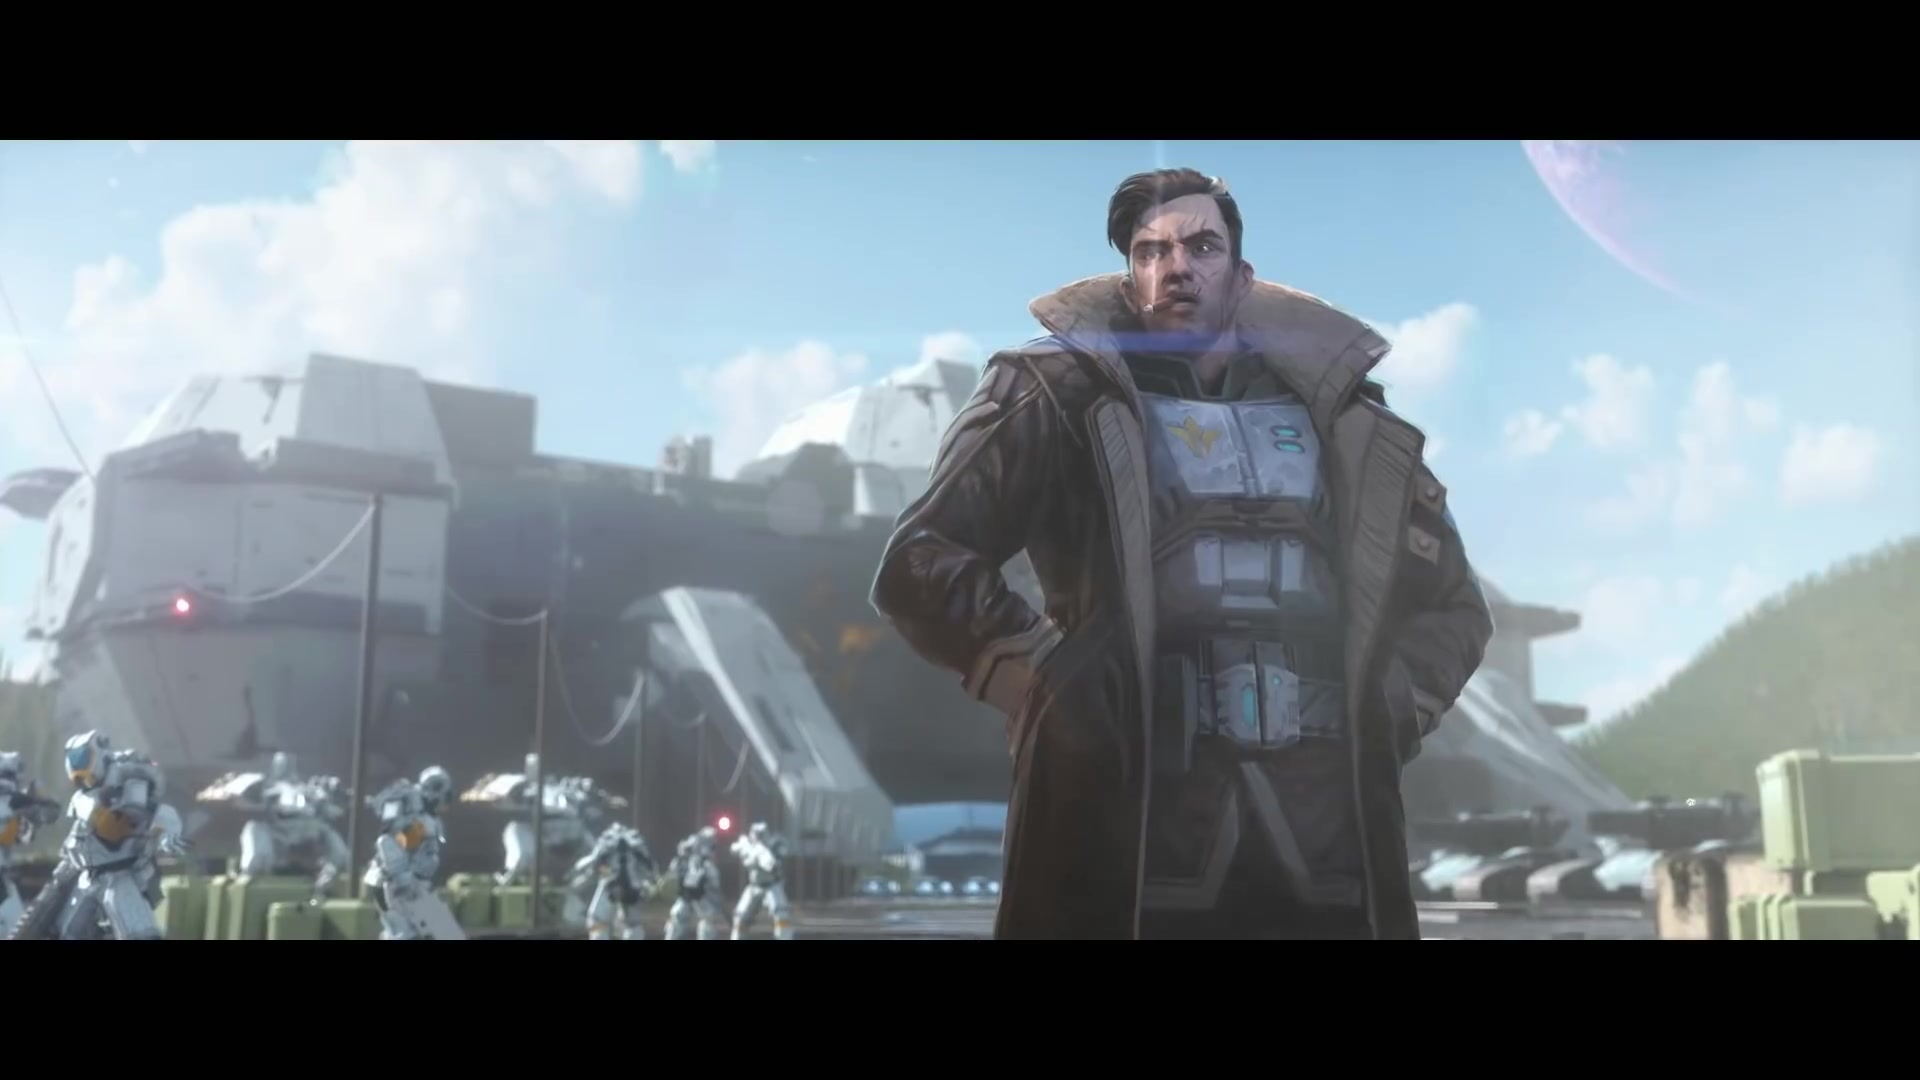 Paradox公布科幻新作《奇迹时代:星陨》发行日期